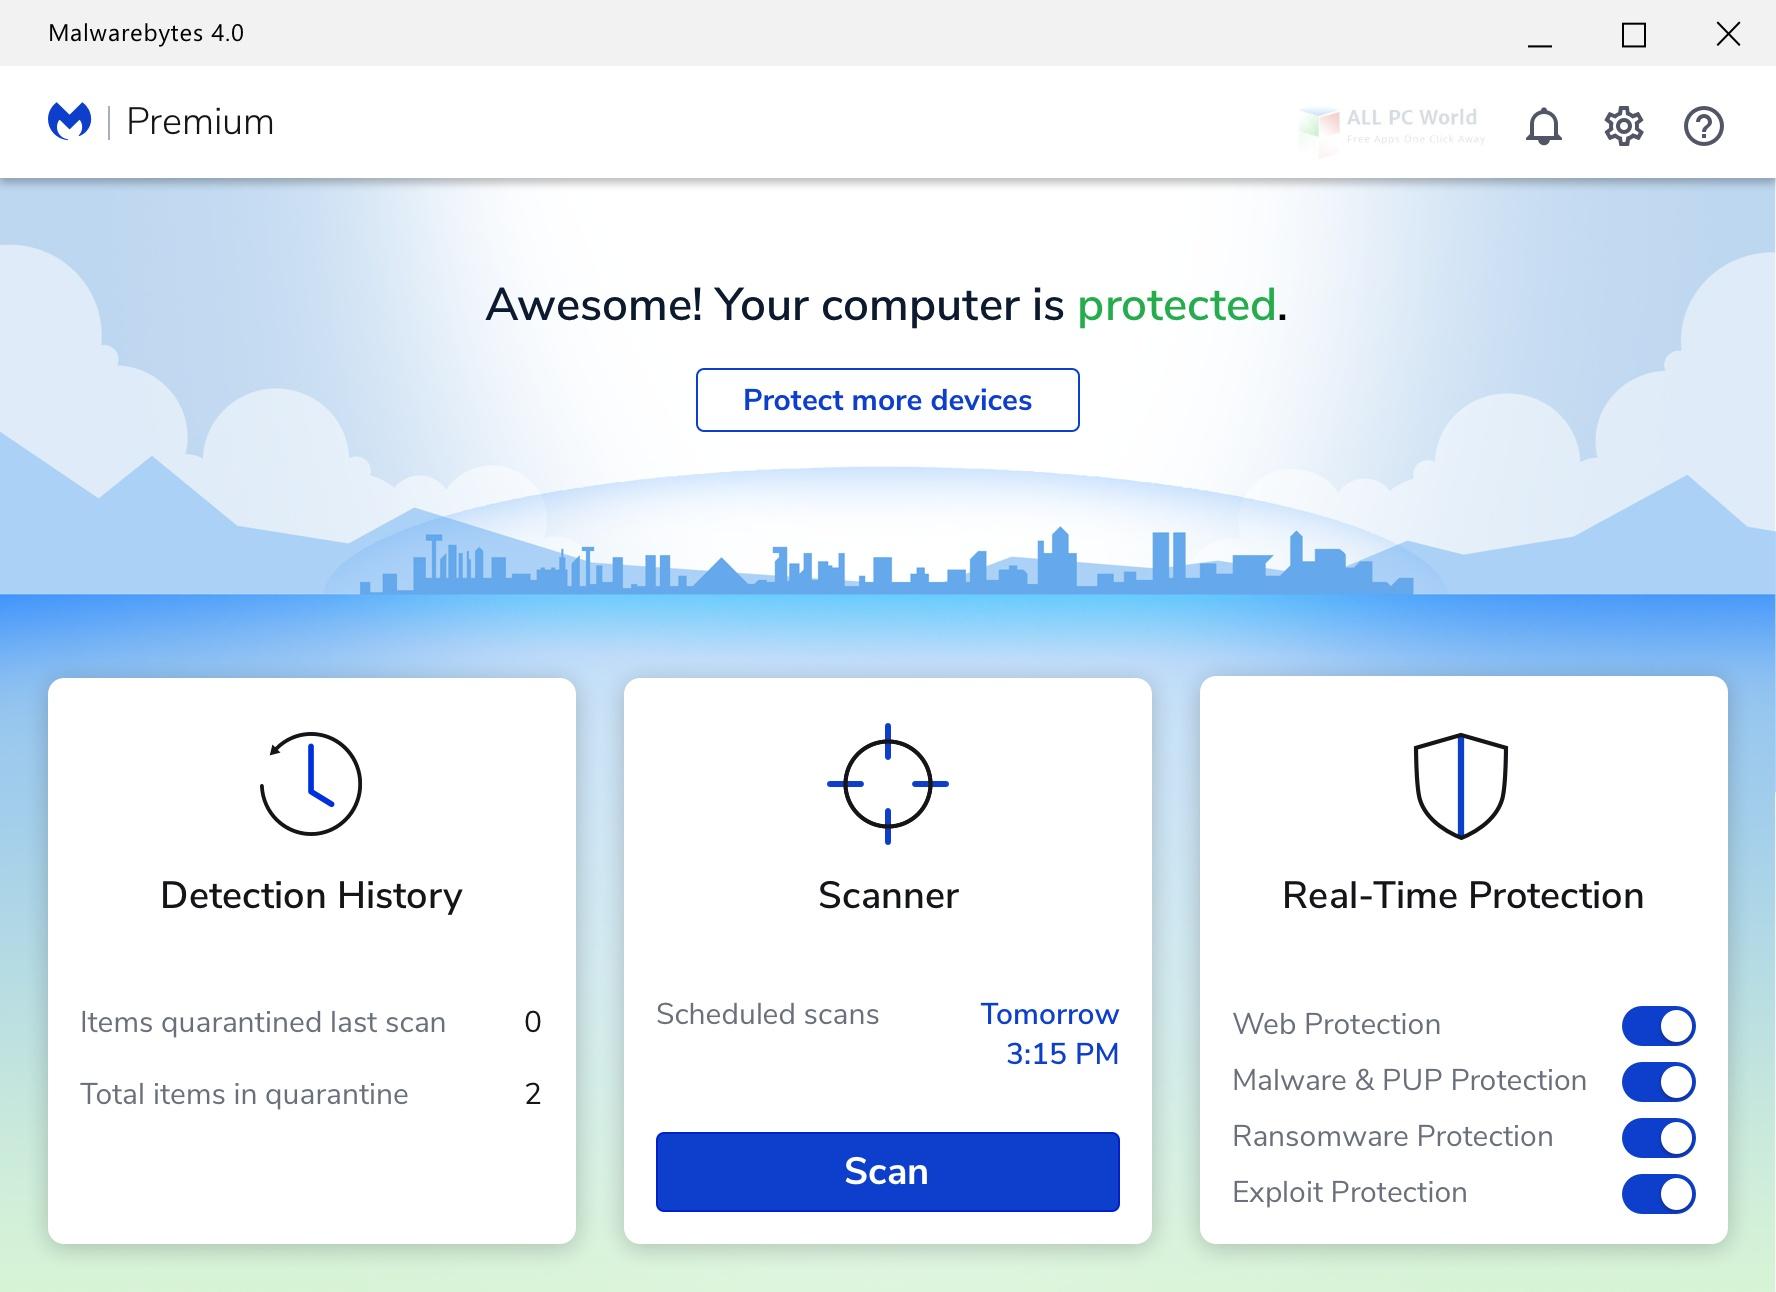 Malwarebytes Antimalware Premium 4.0